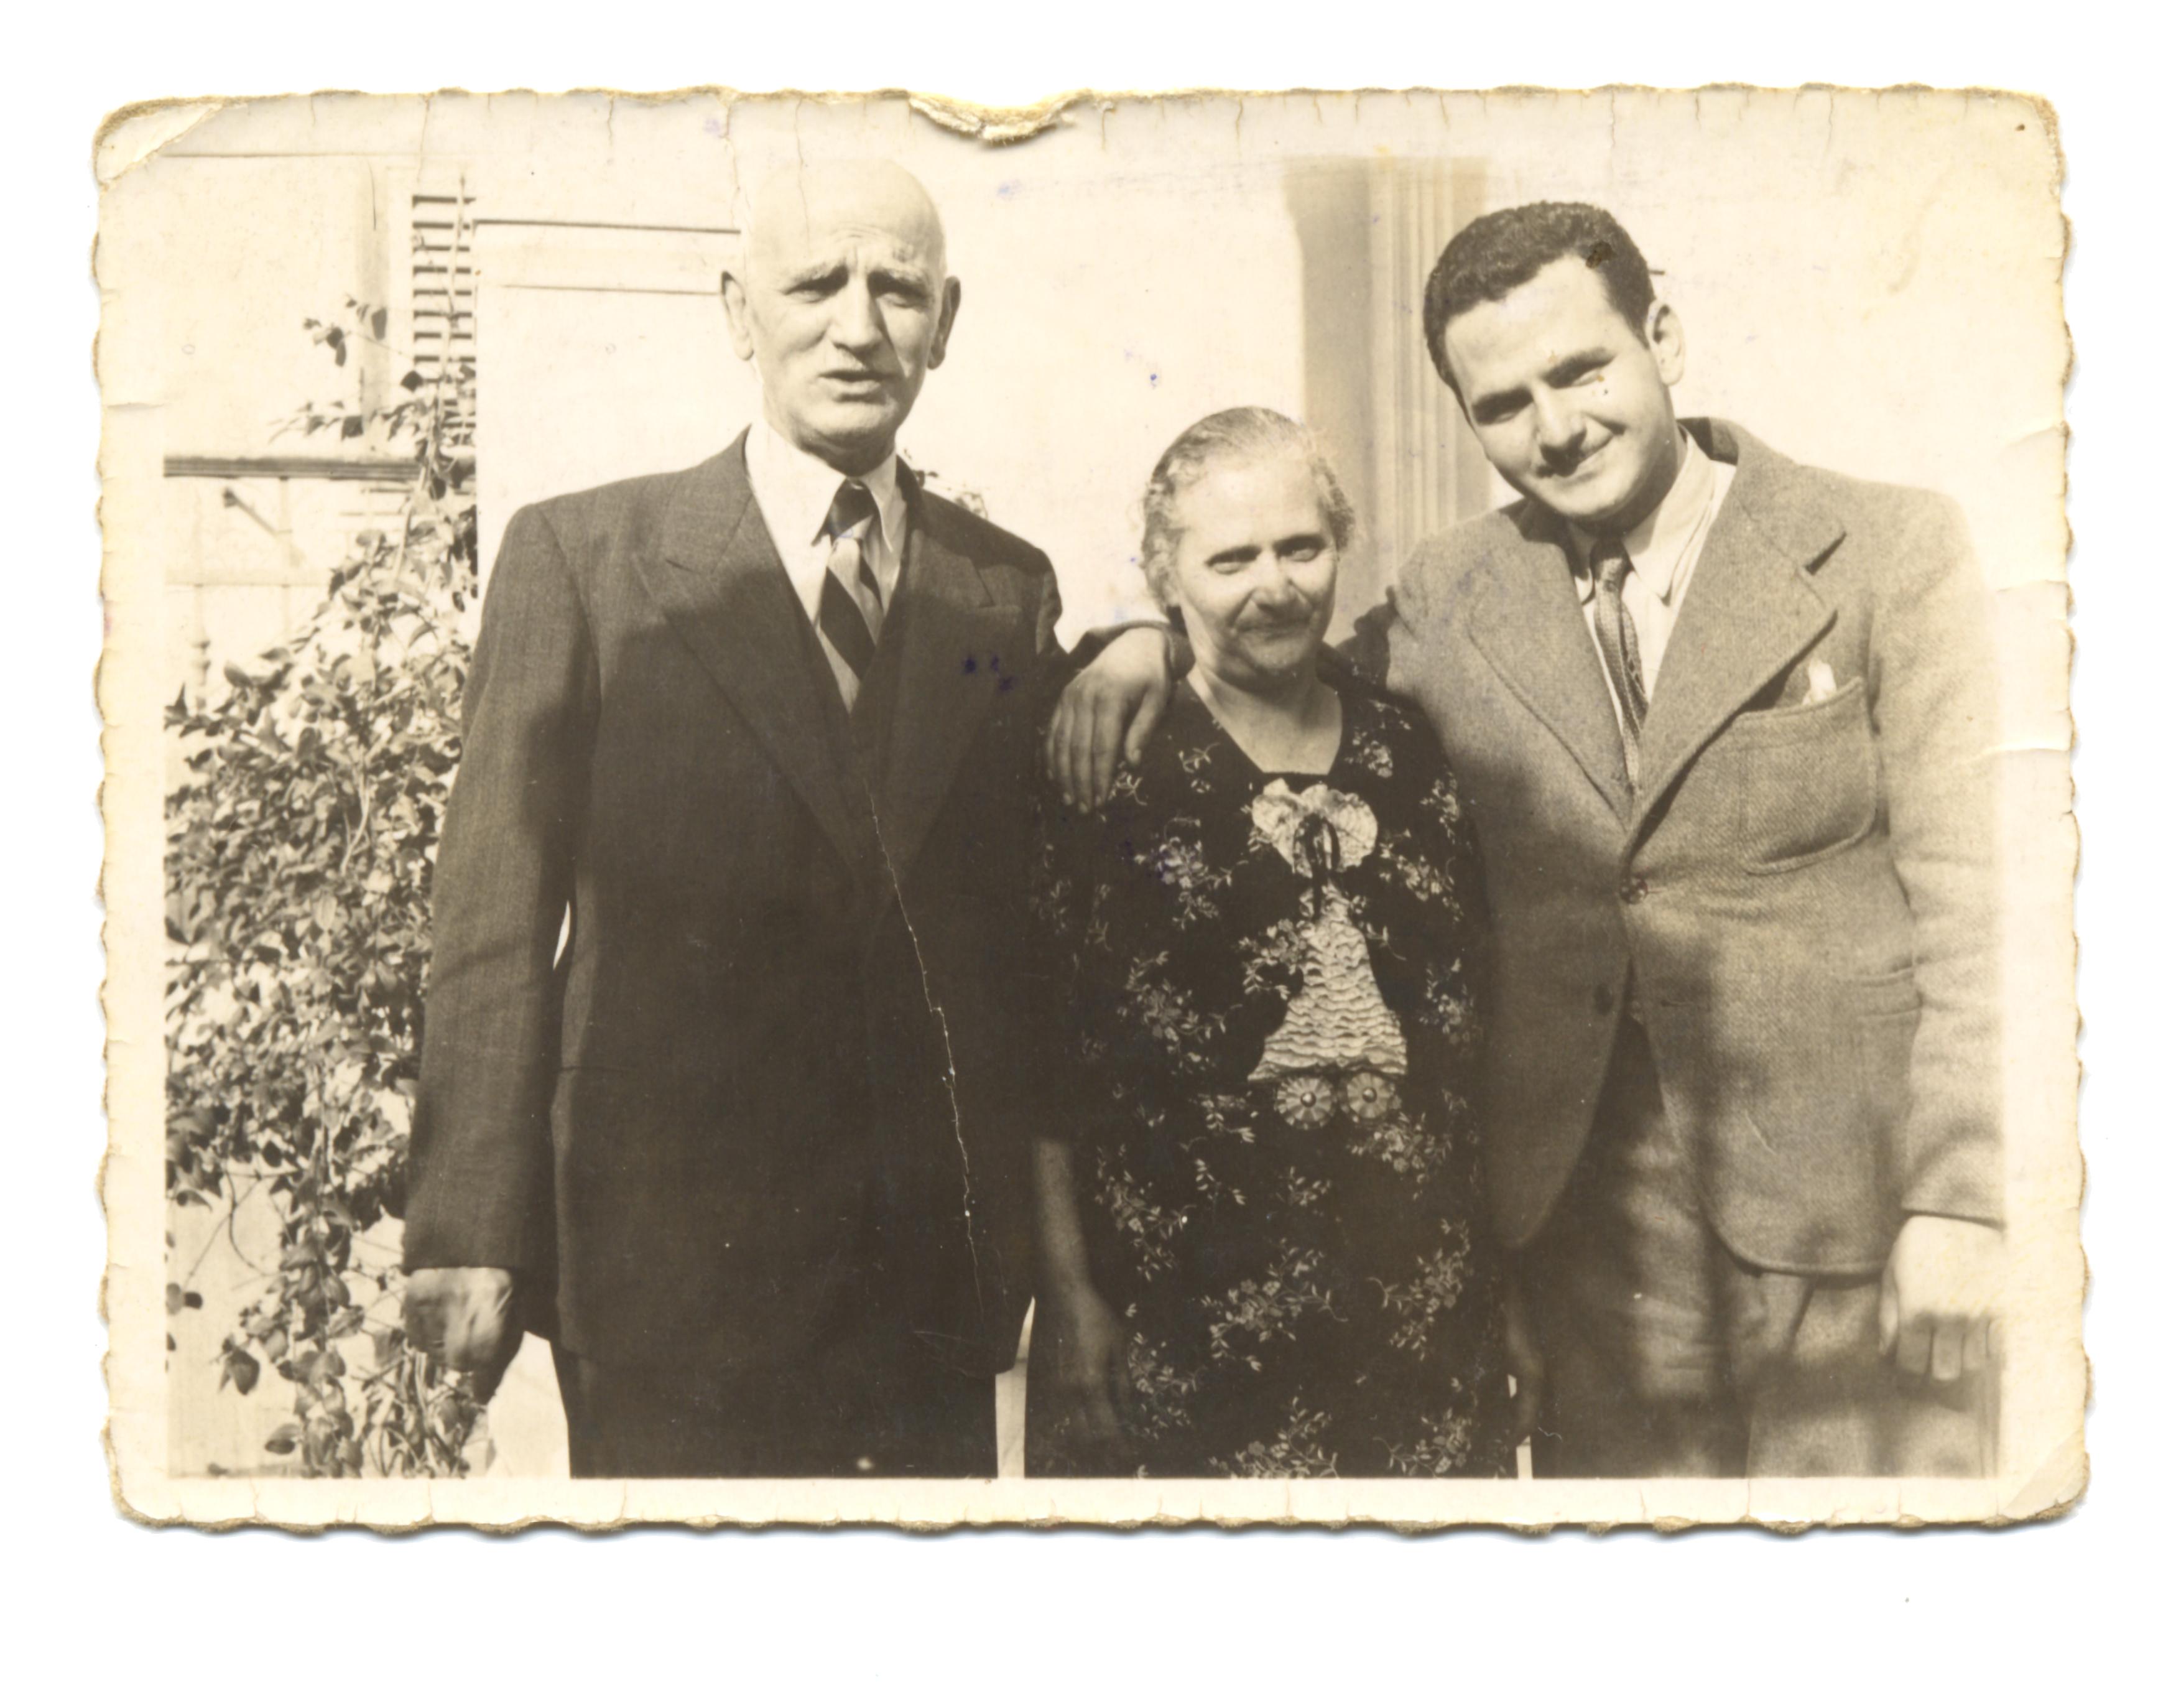 Solon Molho and his parents, Mair and Sterina Molho